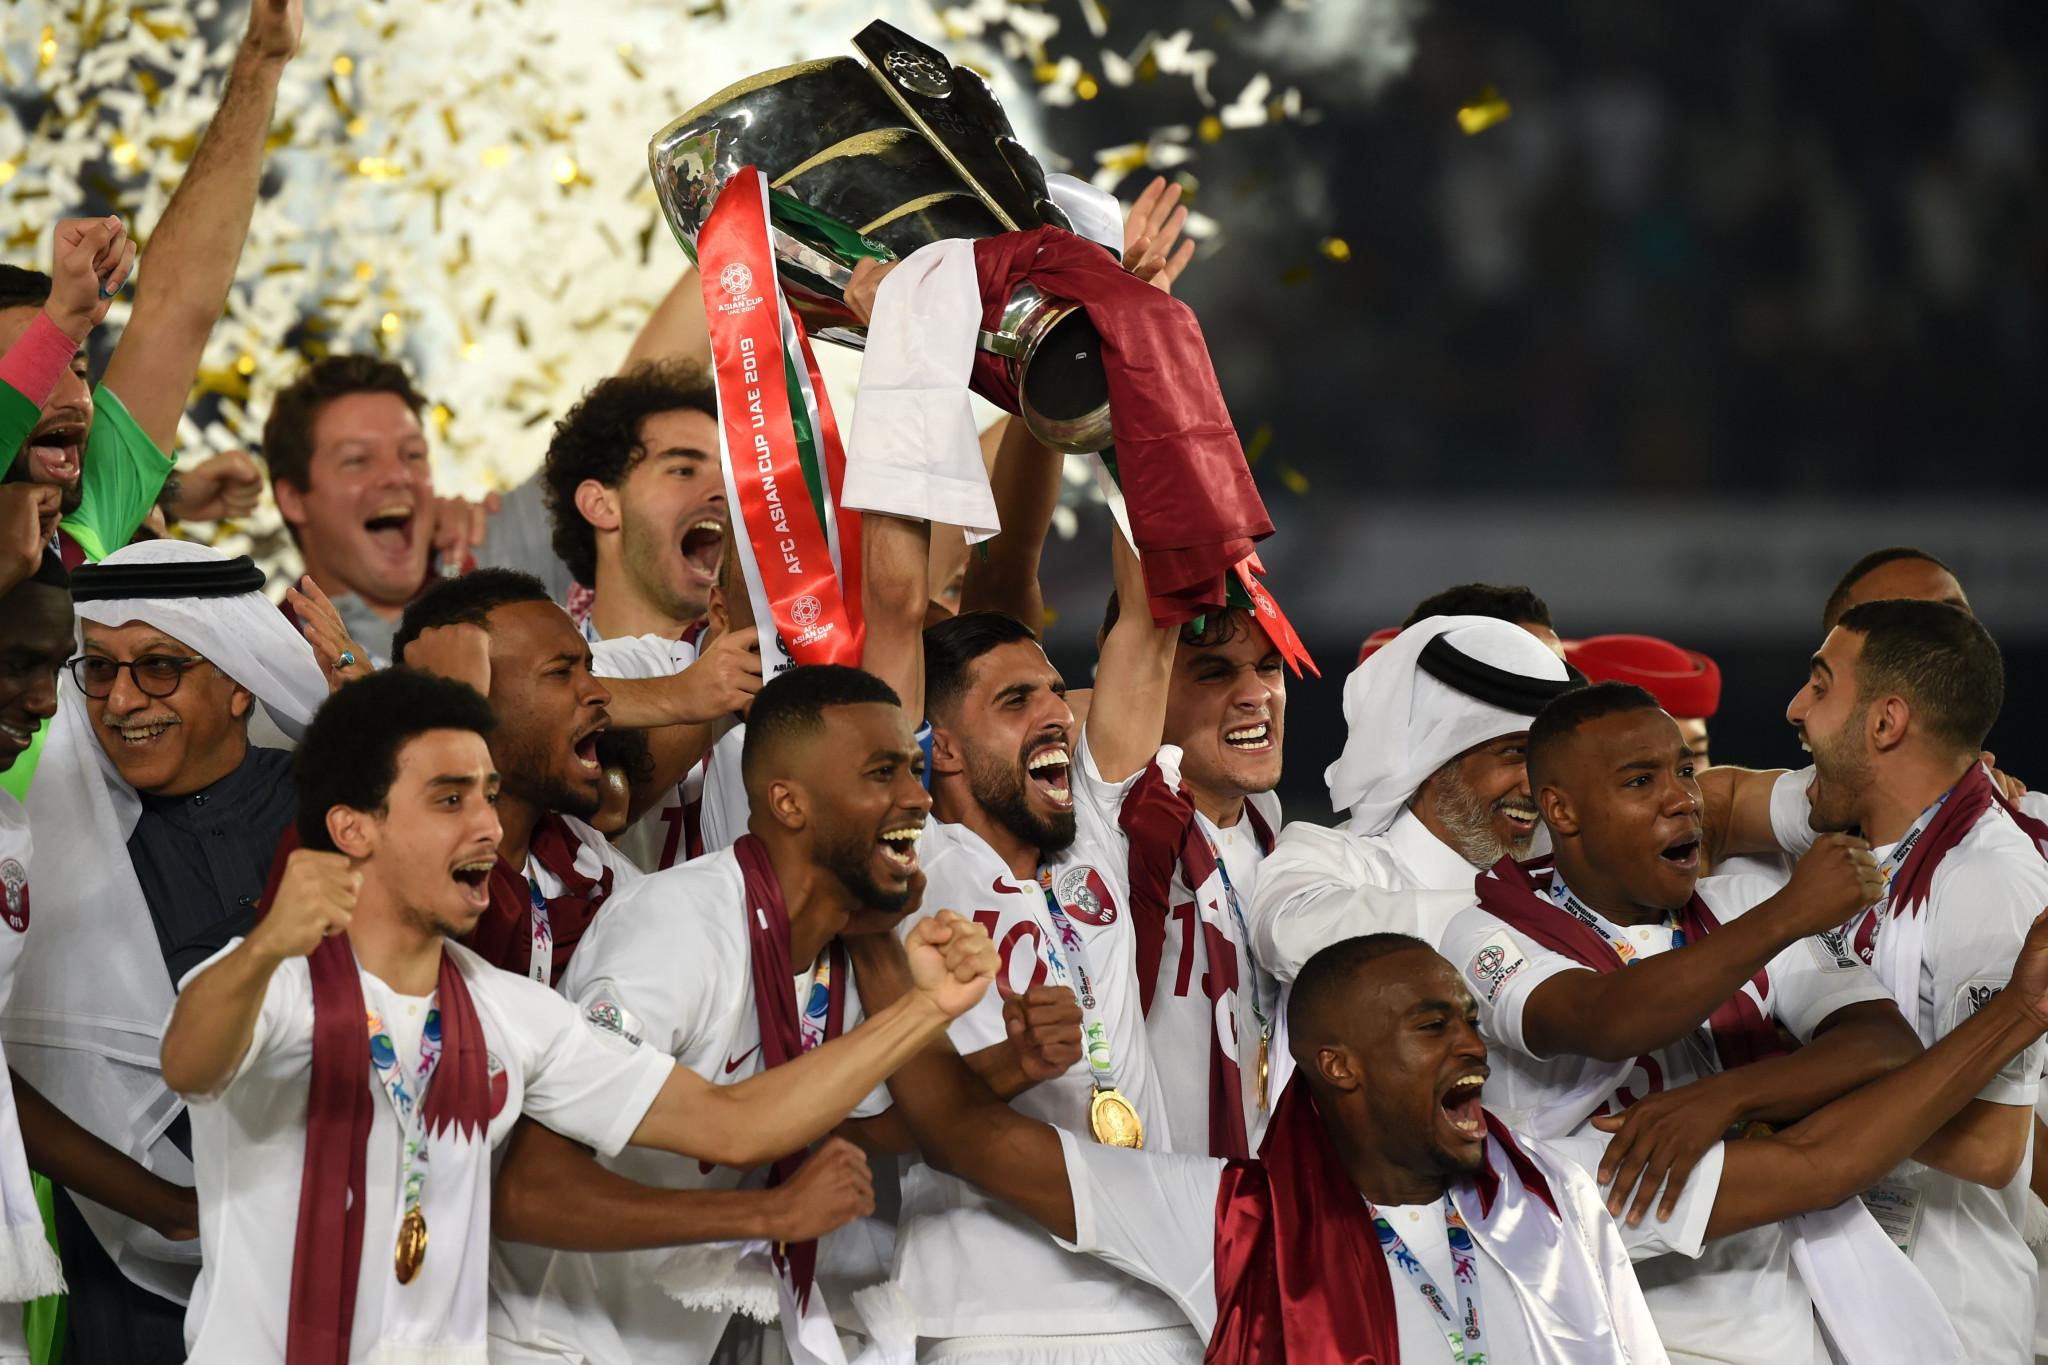 Qatar preparing 2027 AFC Asian Cup bid against Saudi Arabia